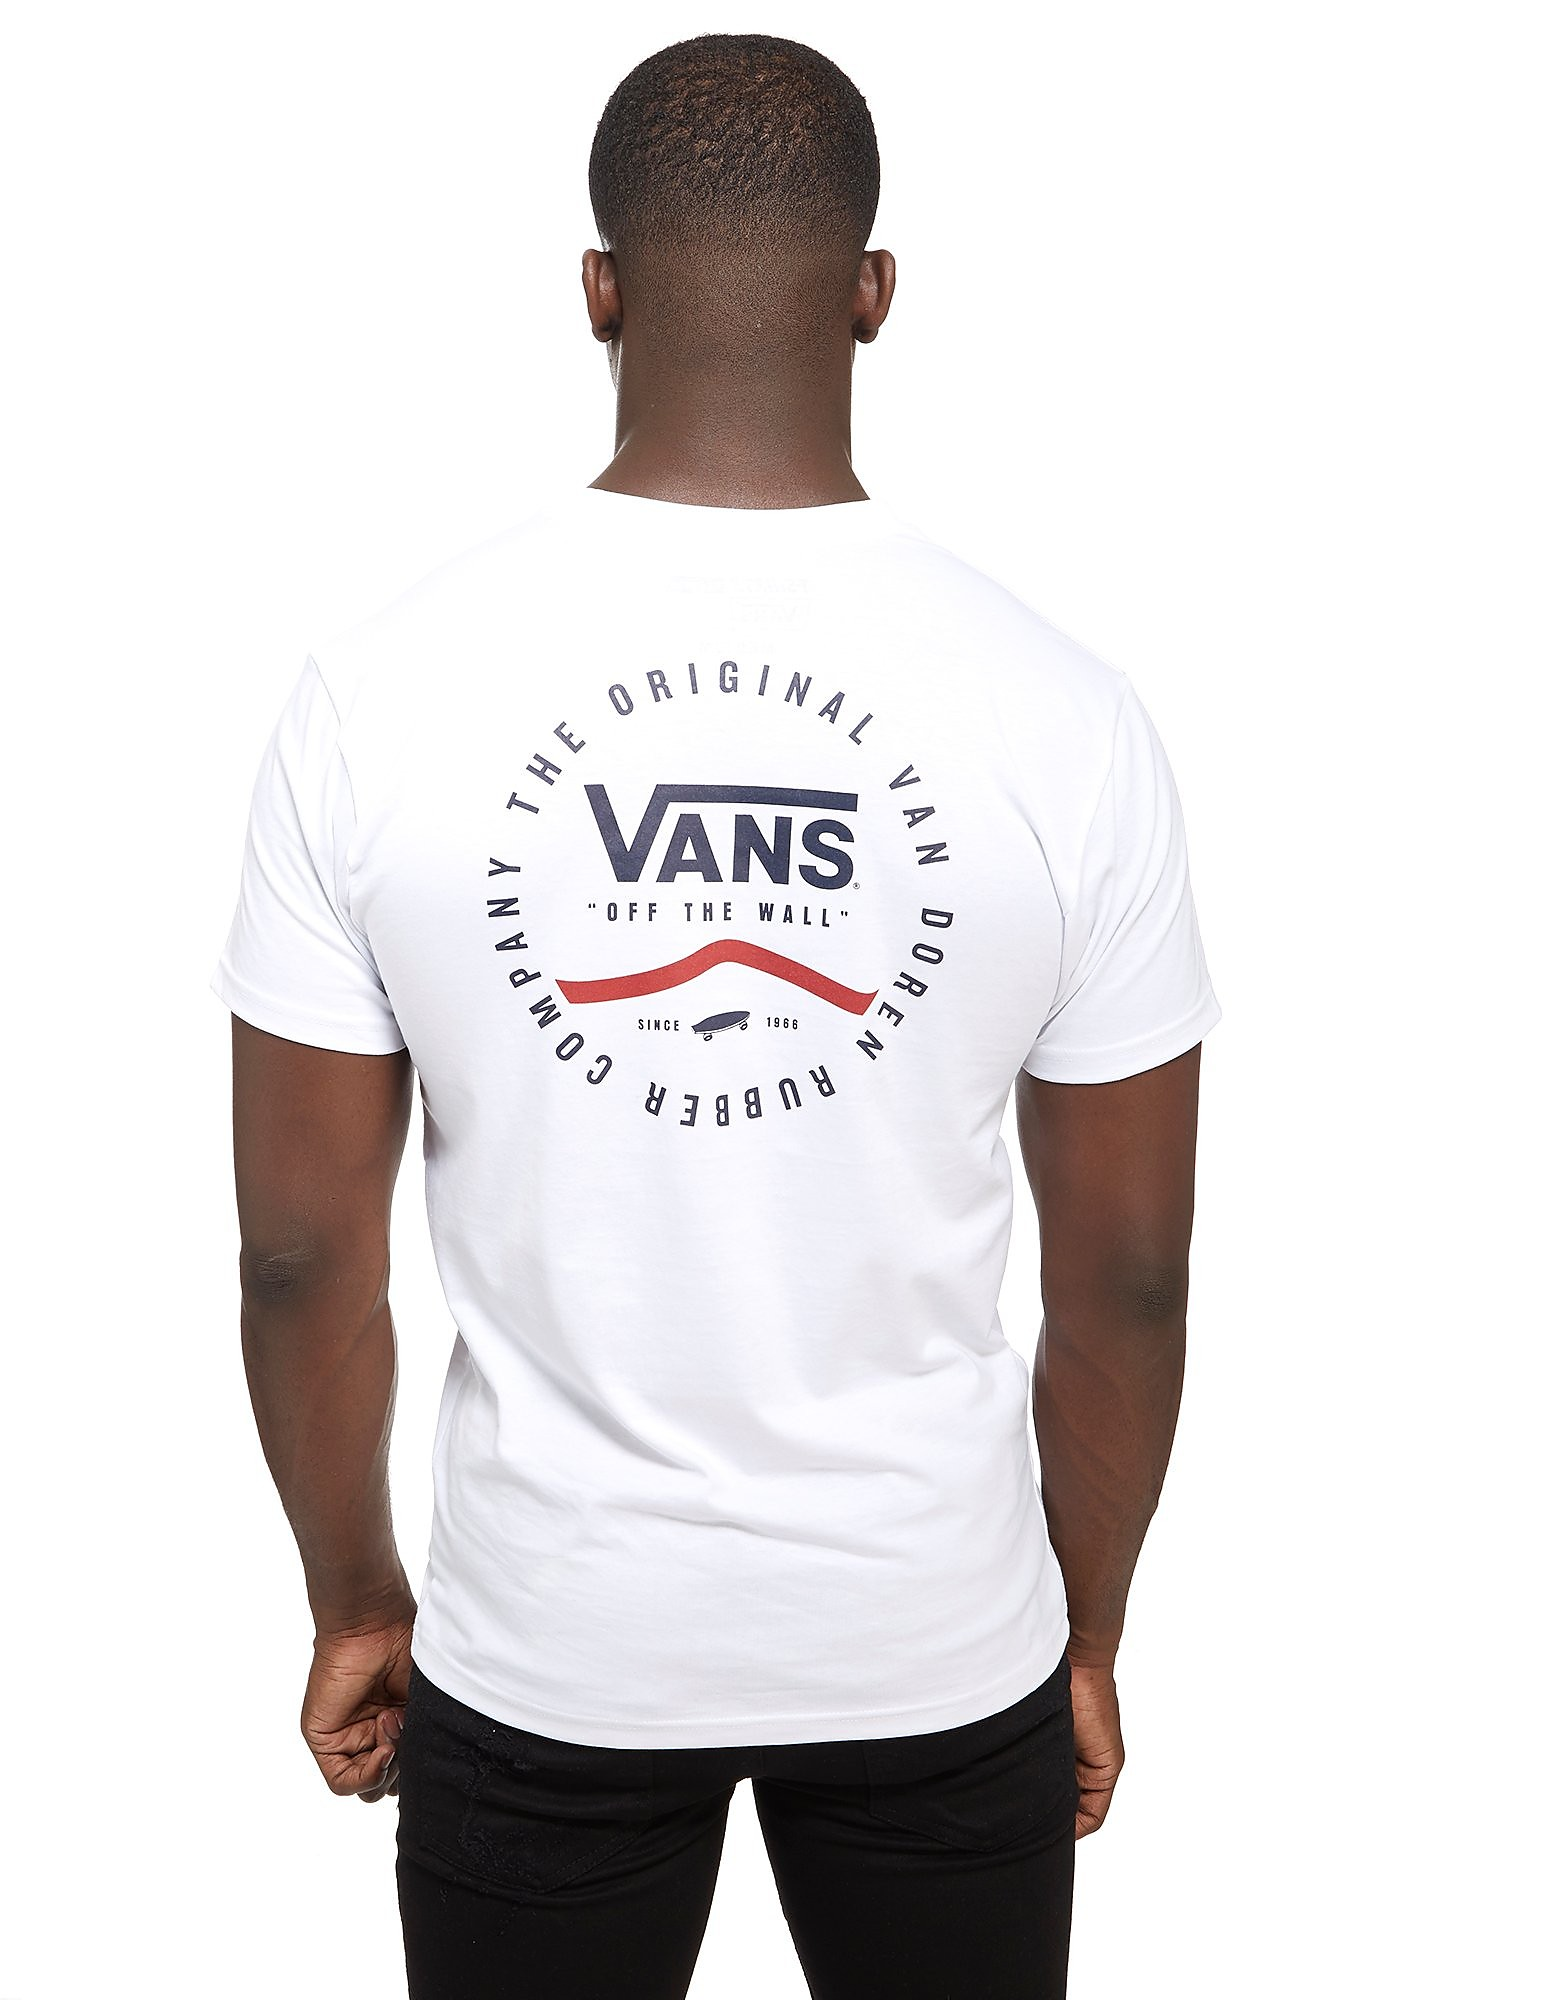 Vans Original T-shirt